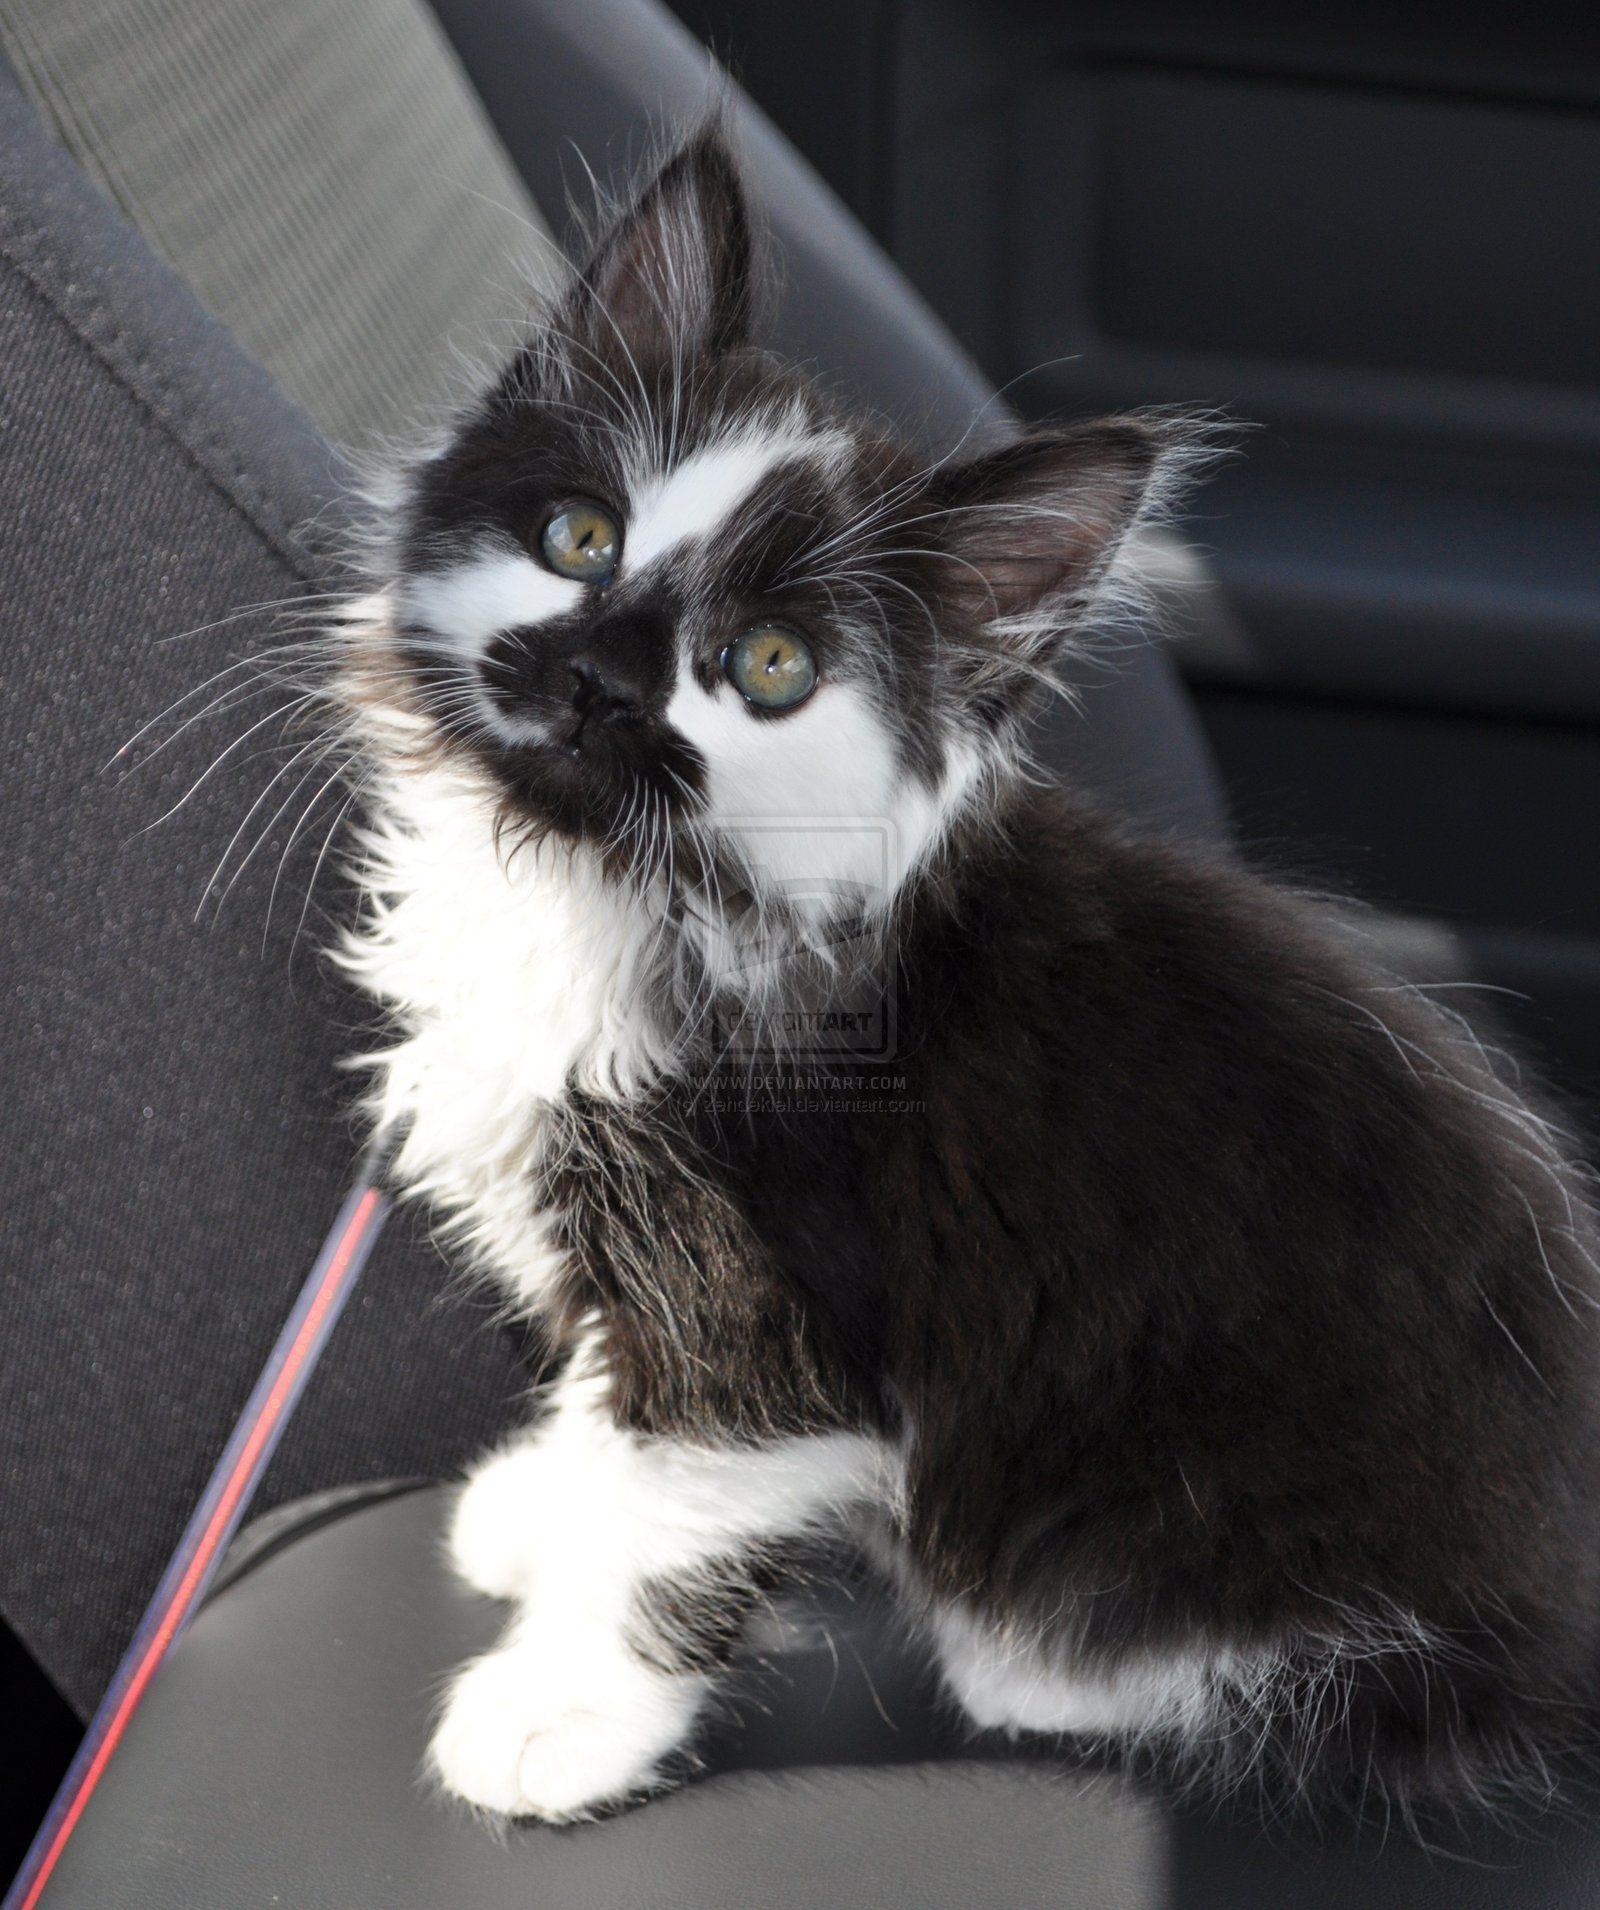 Sixty Seben By Zehdekiel Deviantart Com On Deviantart Pretty Cats Kittens Cutest Cute Cats